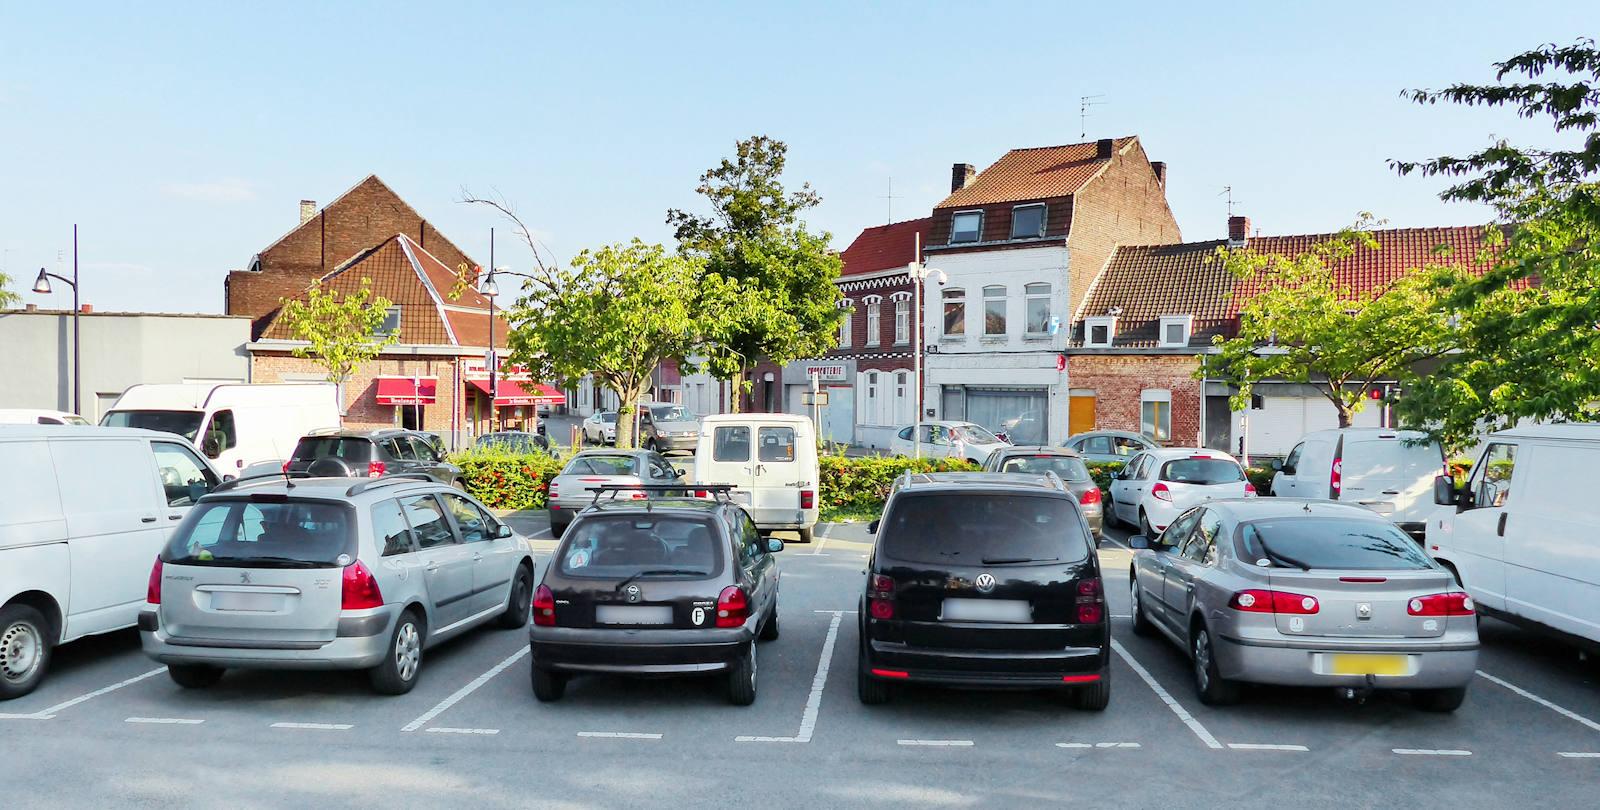 Parking Tourcoing - Place Albert Thomas, Tourcoing